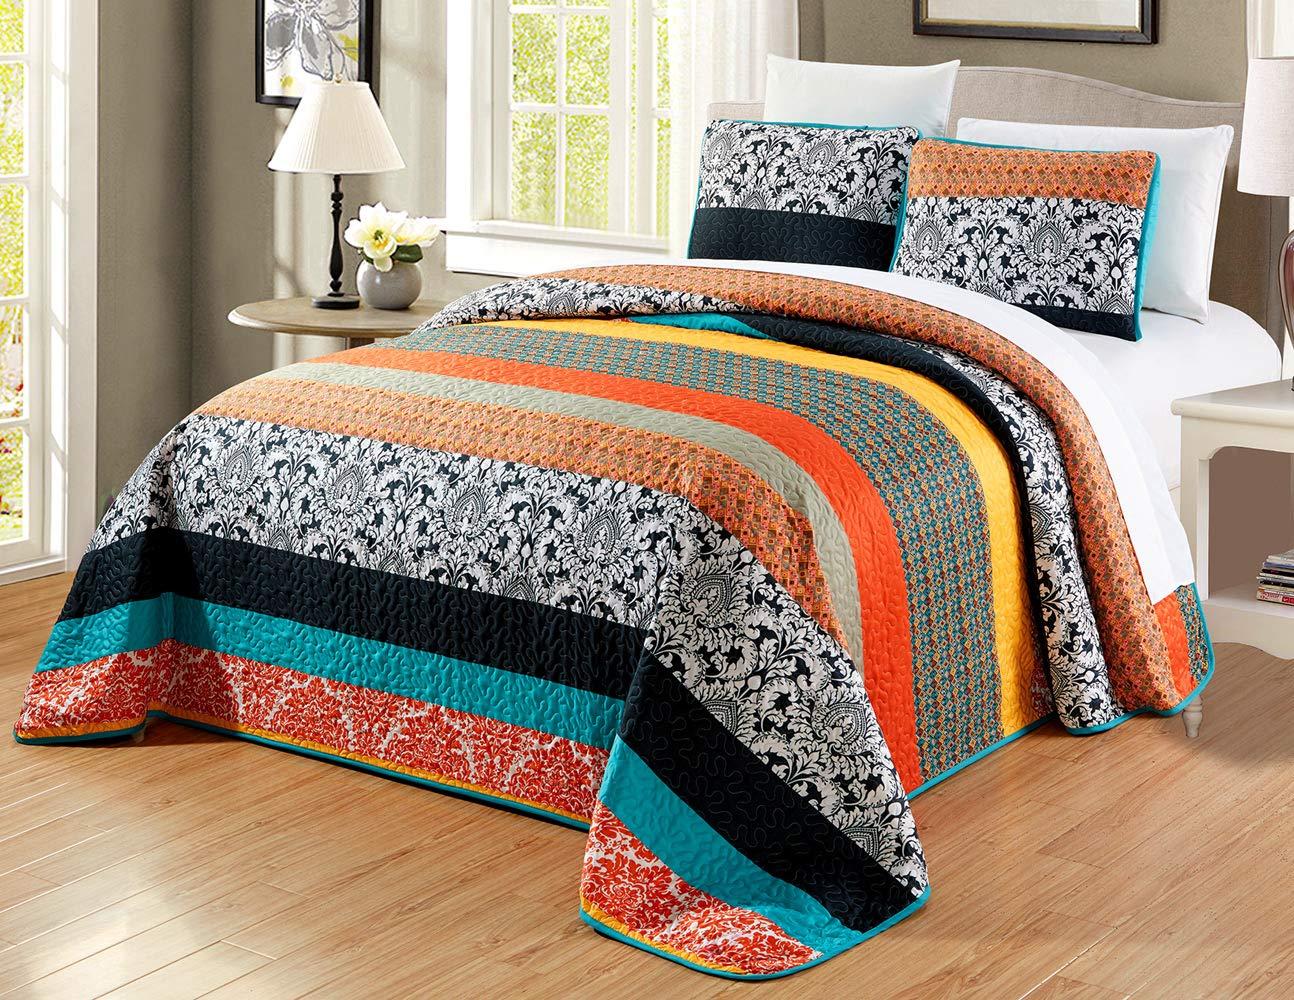 GrandLinen 3-Piece Fine Printed Oversize (115'' X 95'') Quilt Set Reversible Bedspread Coverlet King Size Bed Cover (Multi Color Striped, Blue, Orange, Black, White, Grey)